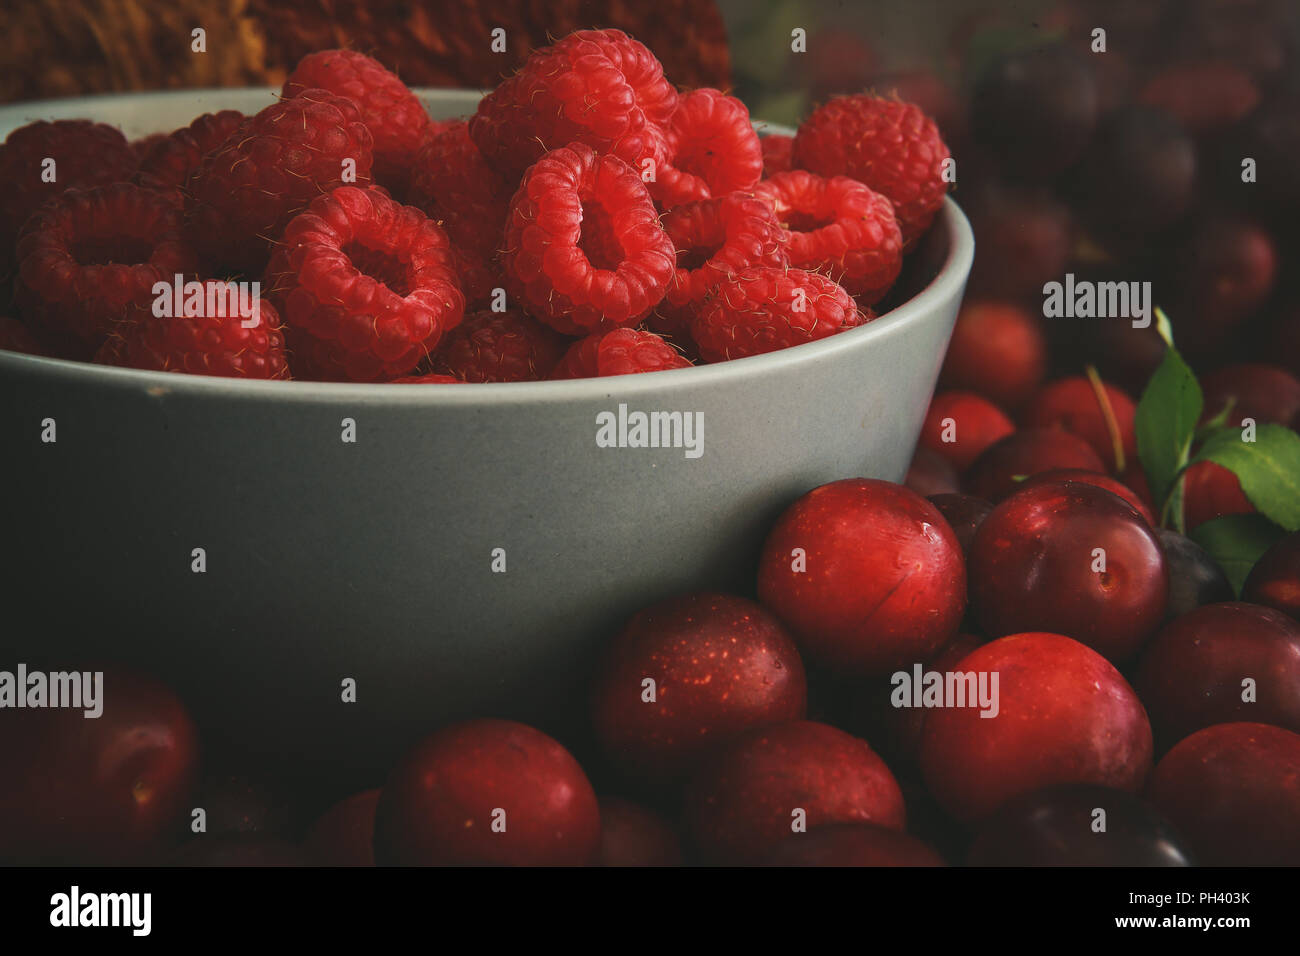 Raspberry and cherry plum - Stock Image